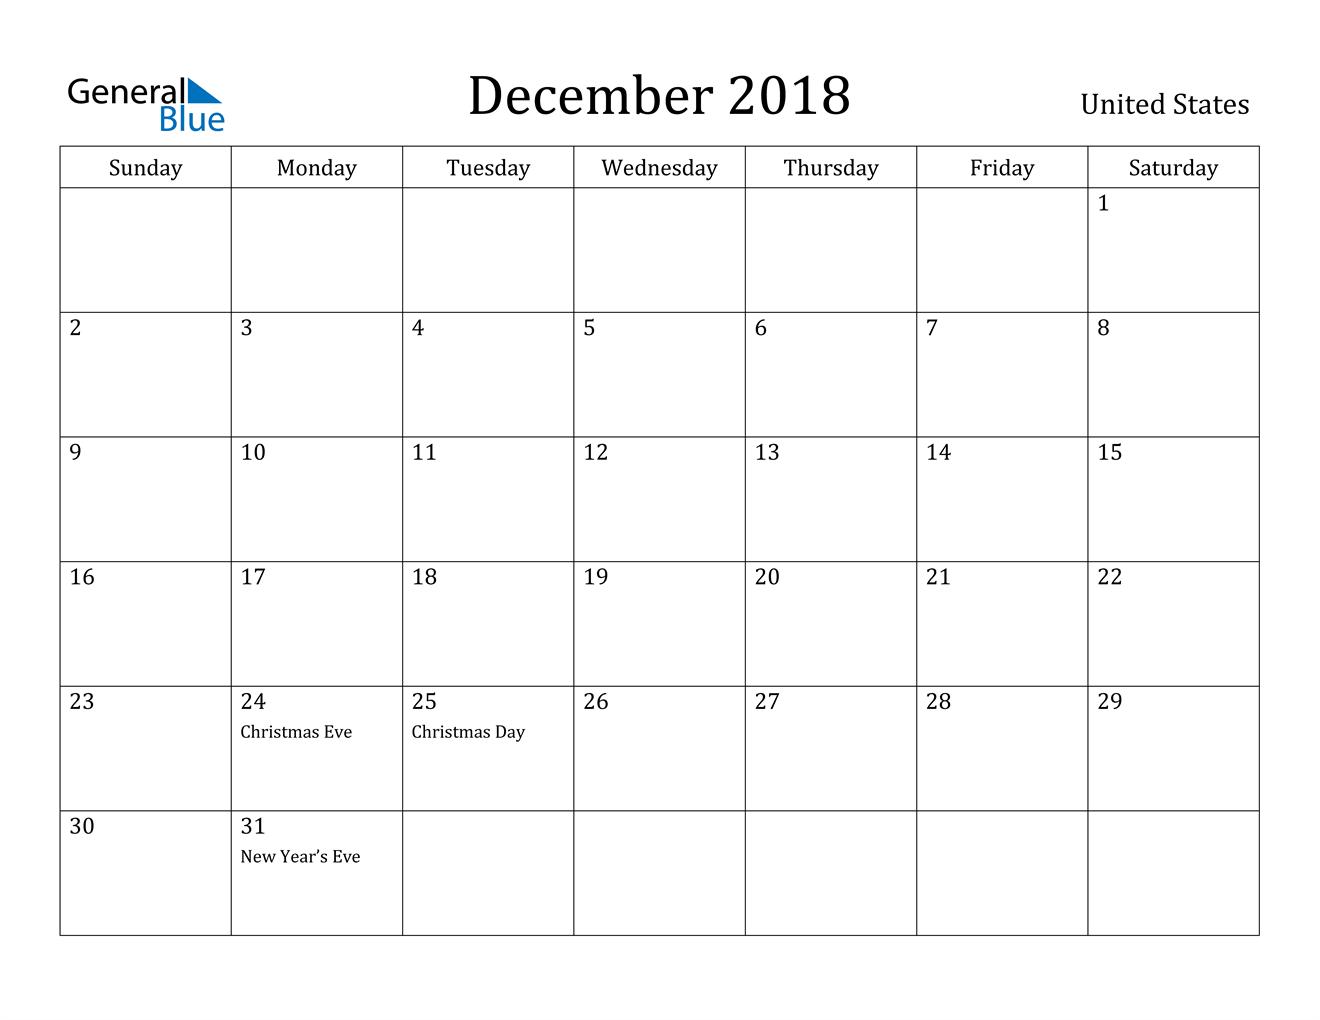 Image of December 2018 United States Calendar with Holidays Calendar